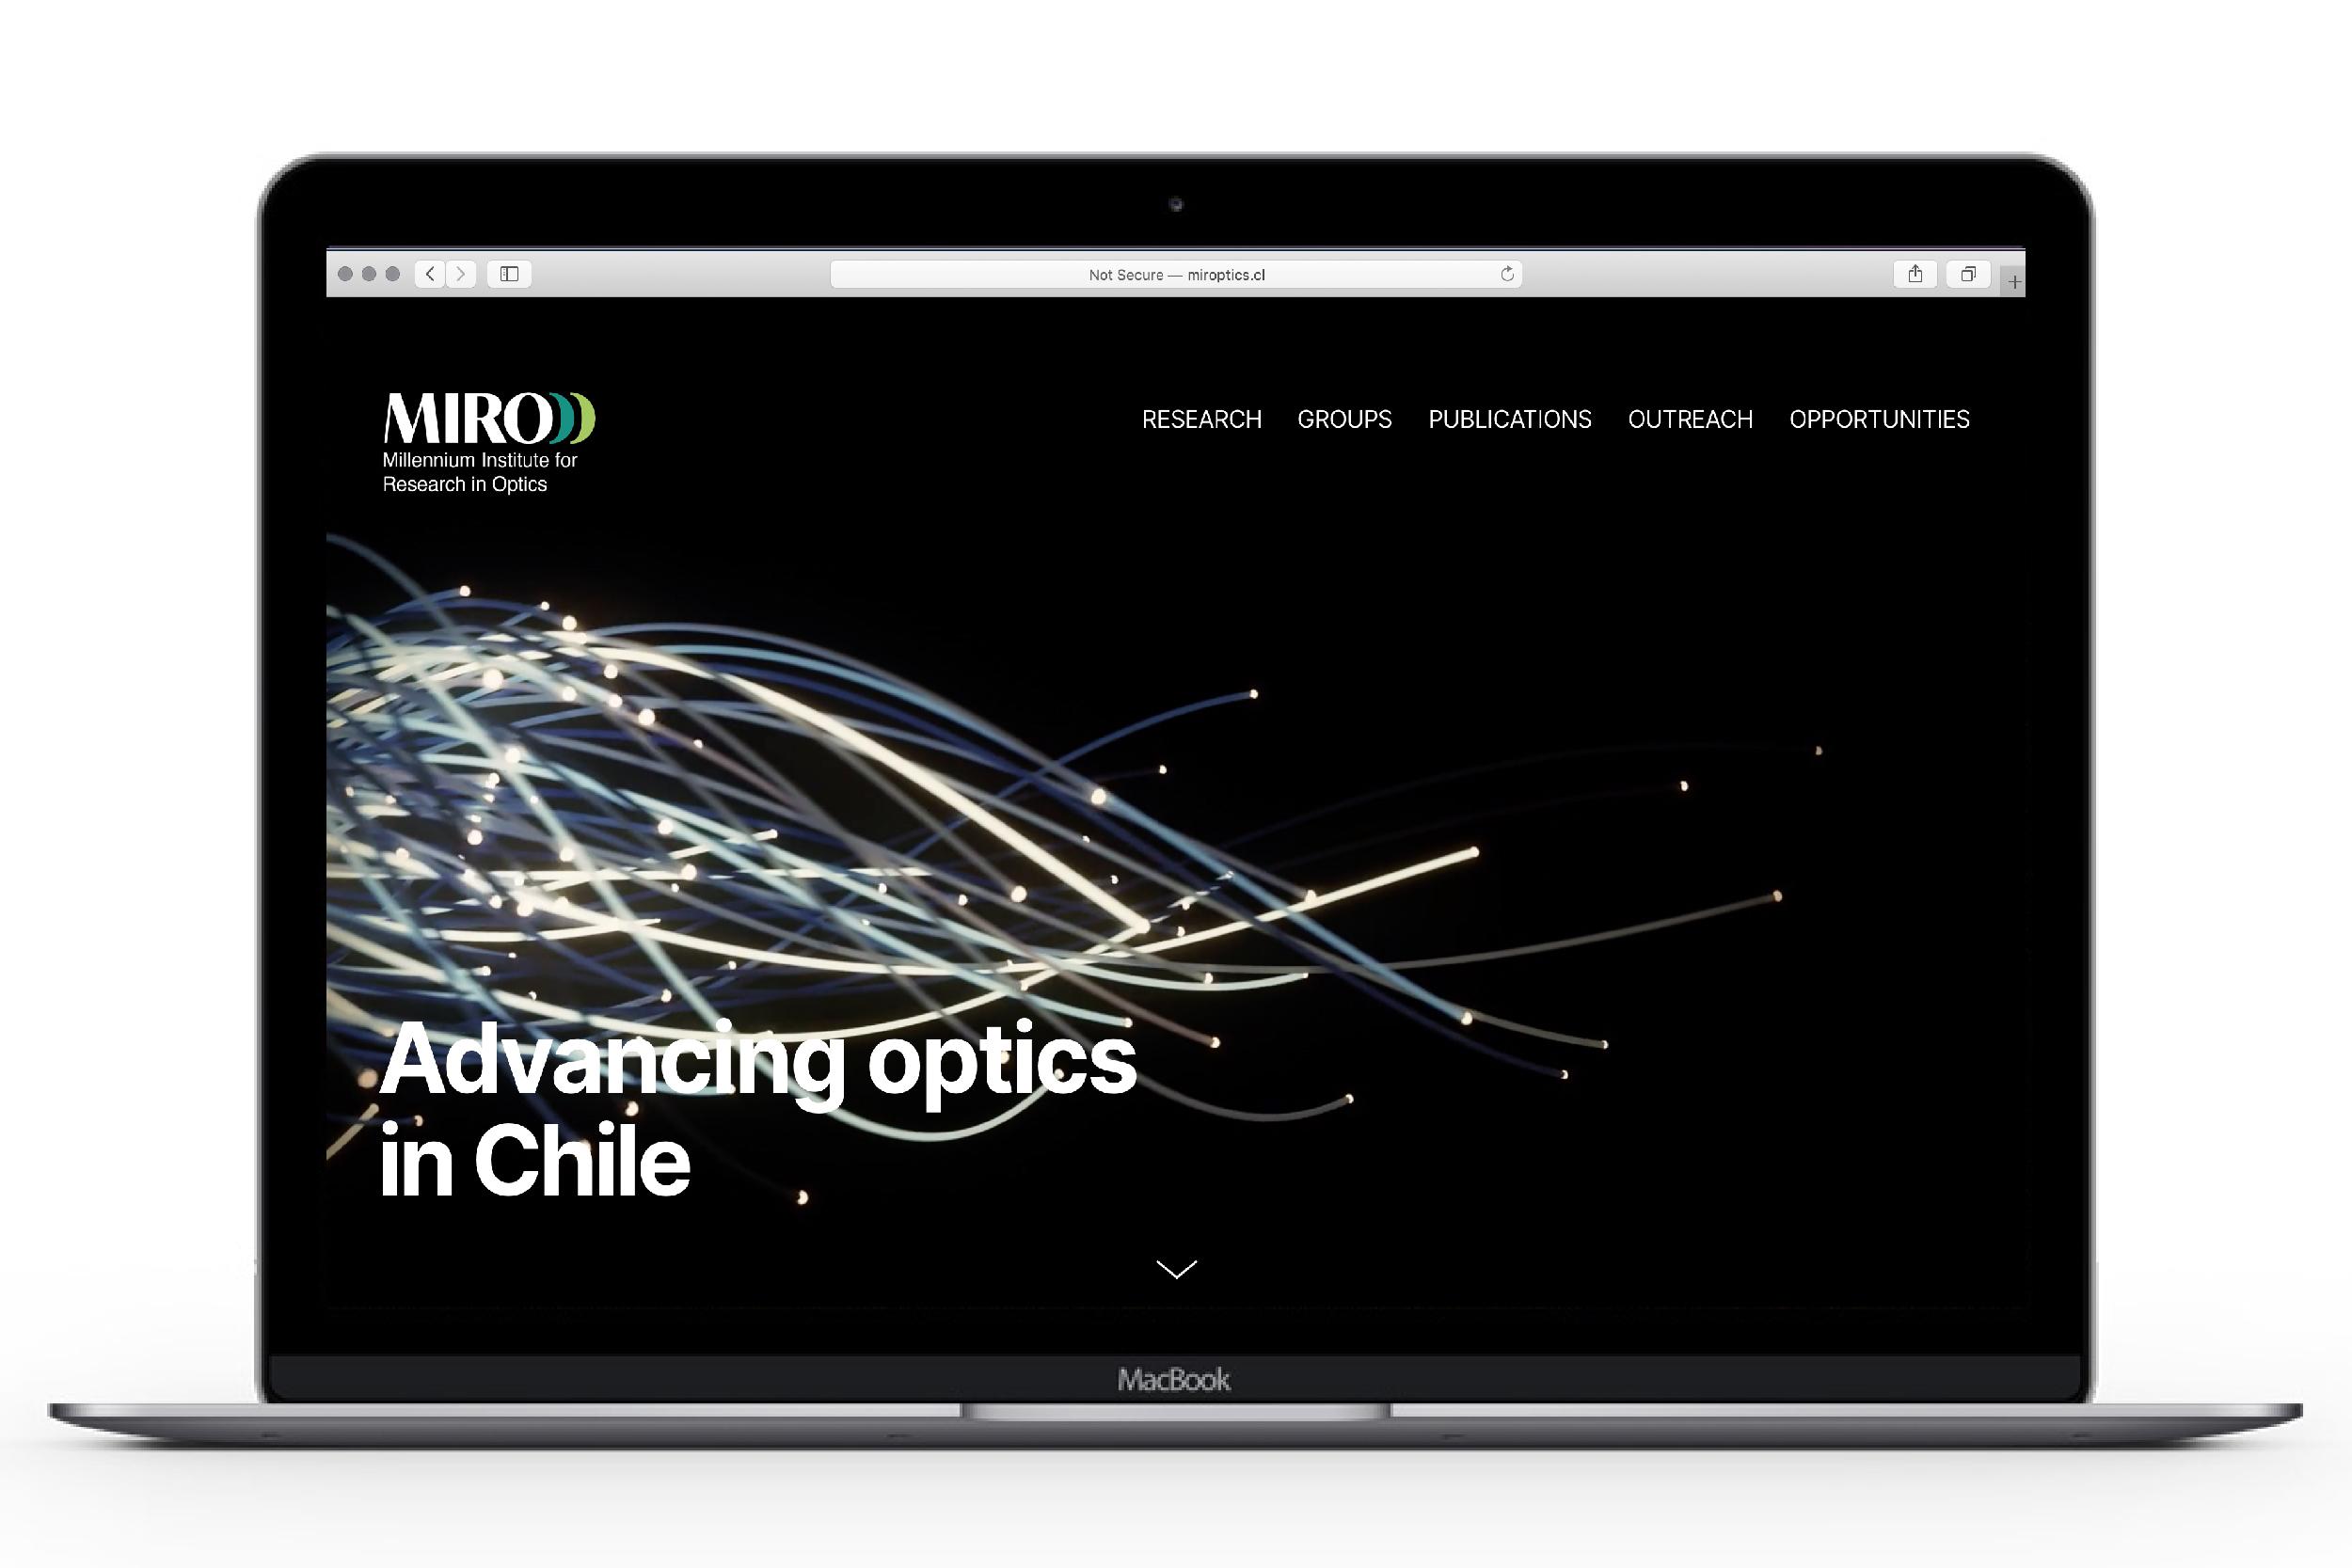 Bitflow-studio-miro-web-design-research-institute-1